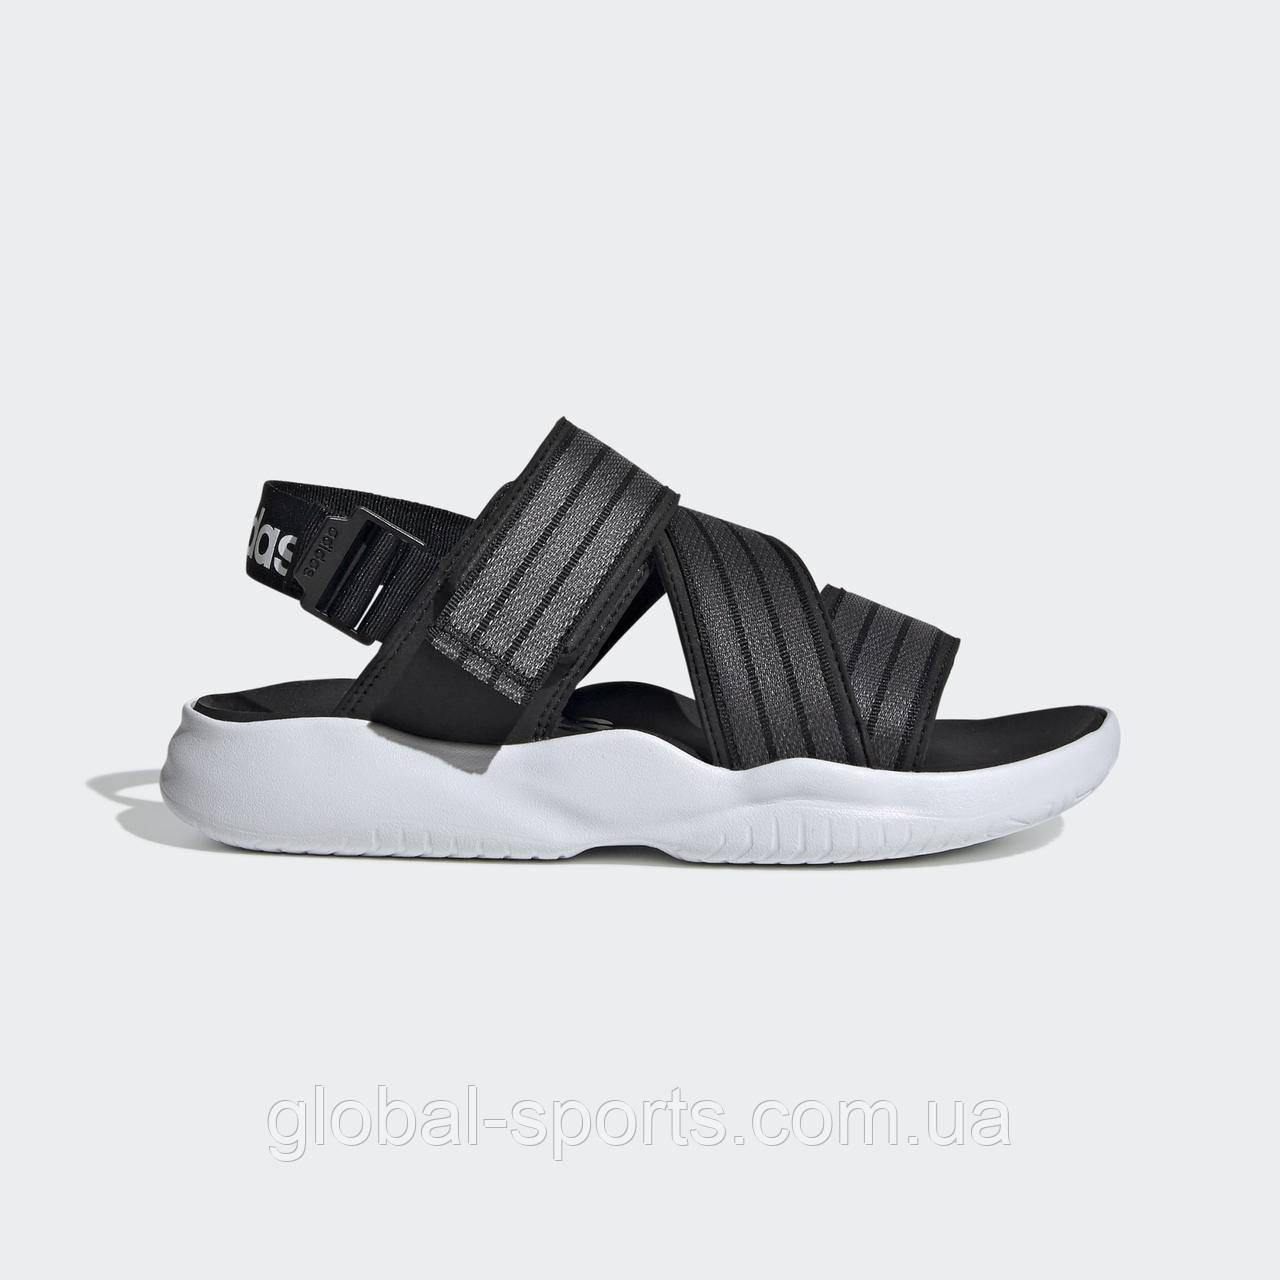 Женские сандалии Adidas 90s SANDAL (Артикул: EG7647)